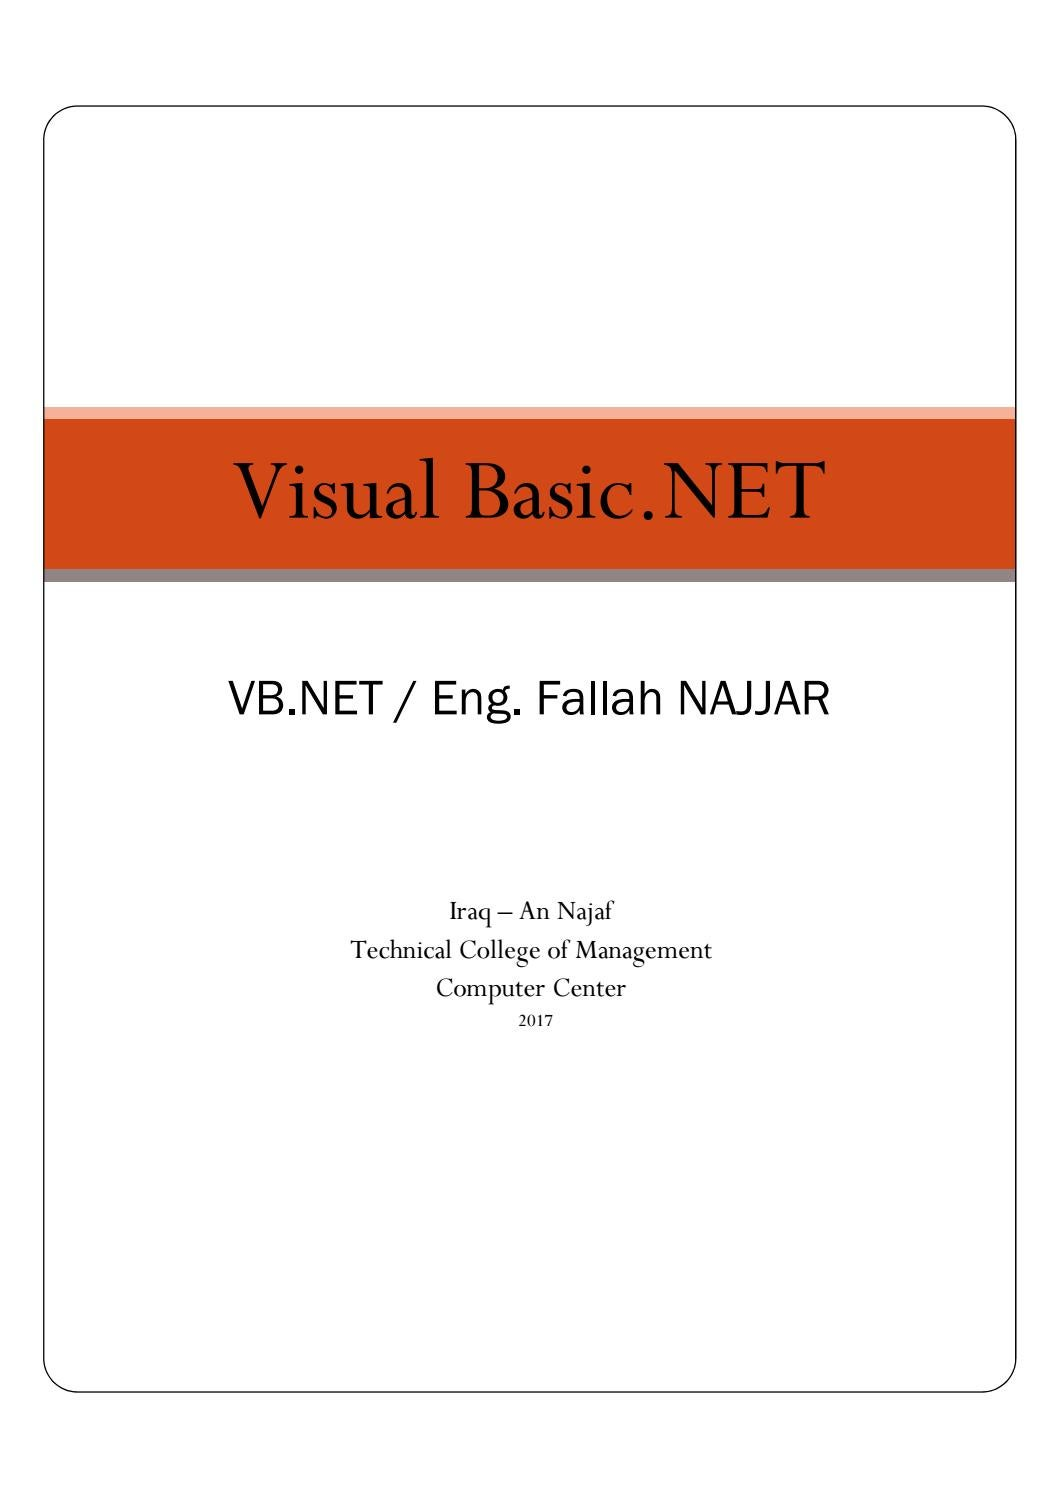 كتاب Visual Basic by جرب و إستفد I Try&Profit - issuu